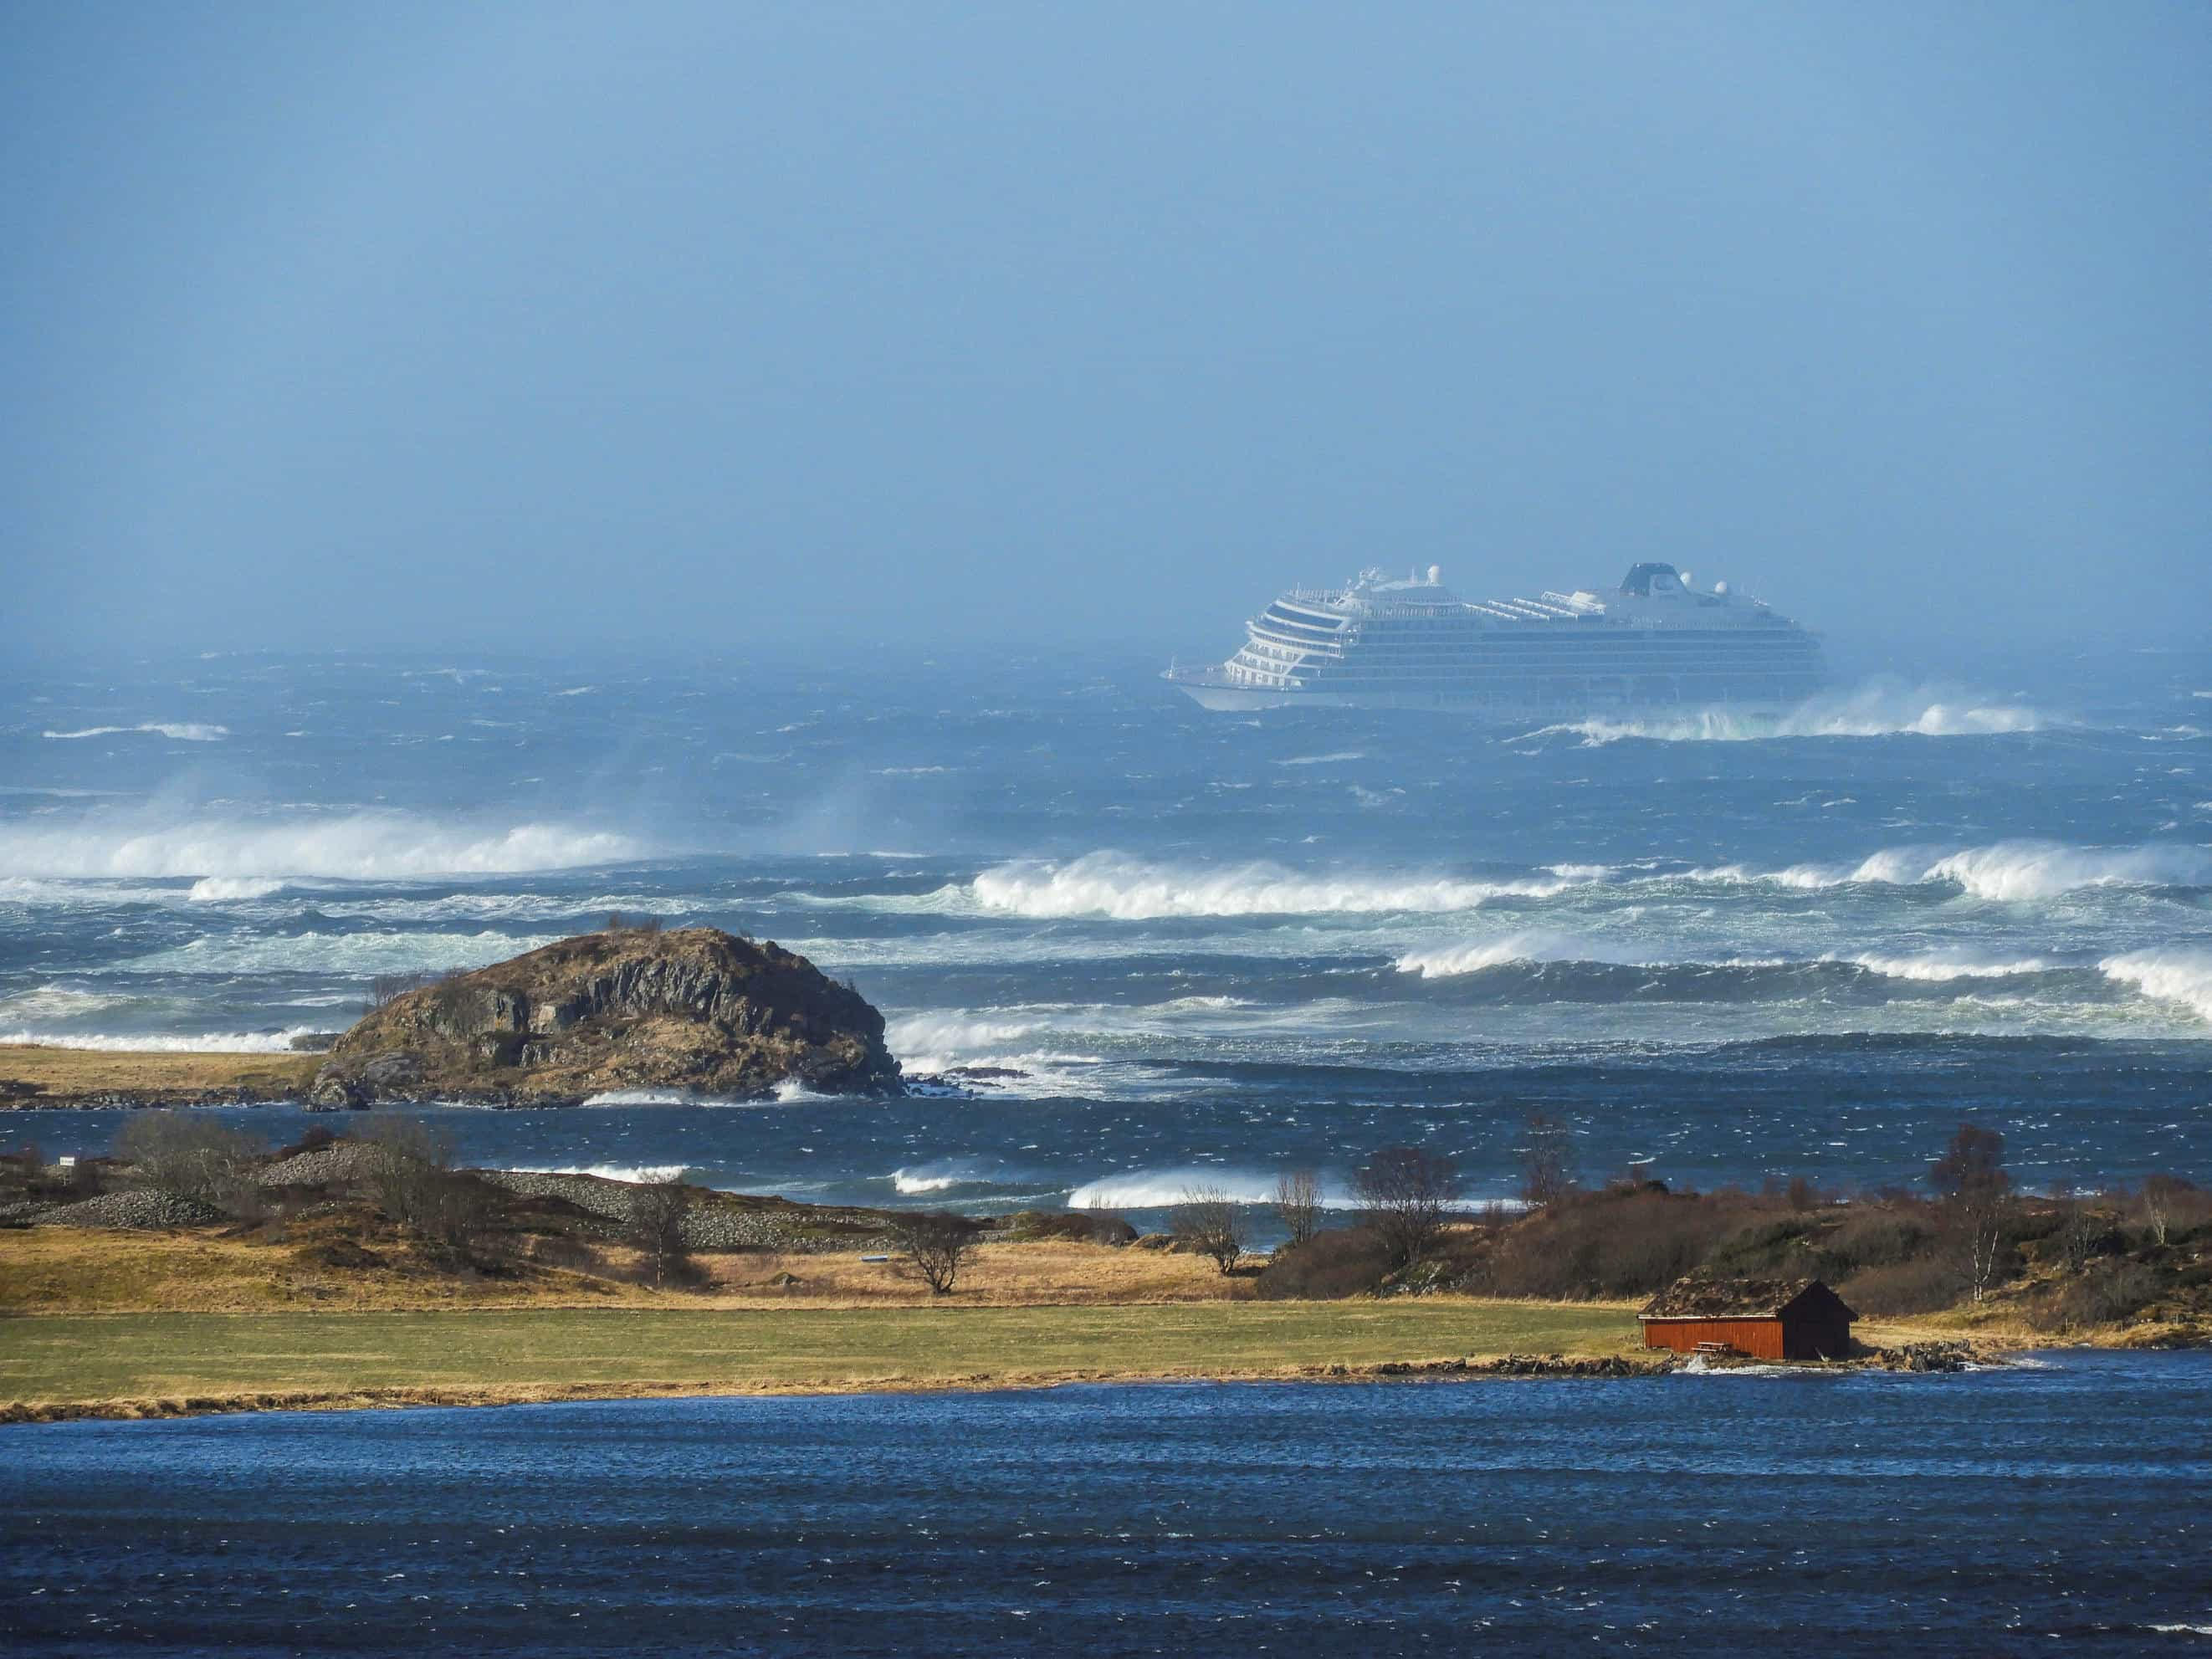 Cruzeiro à deriva na costa da Noruega já conseguiu reiniciar motores